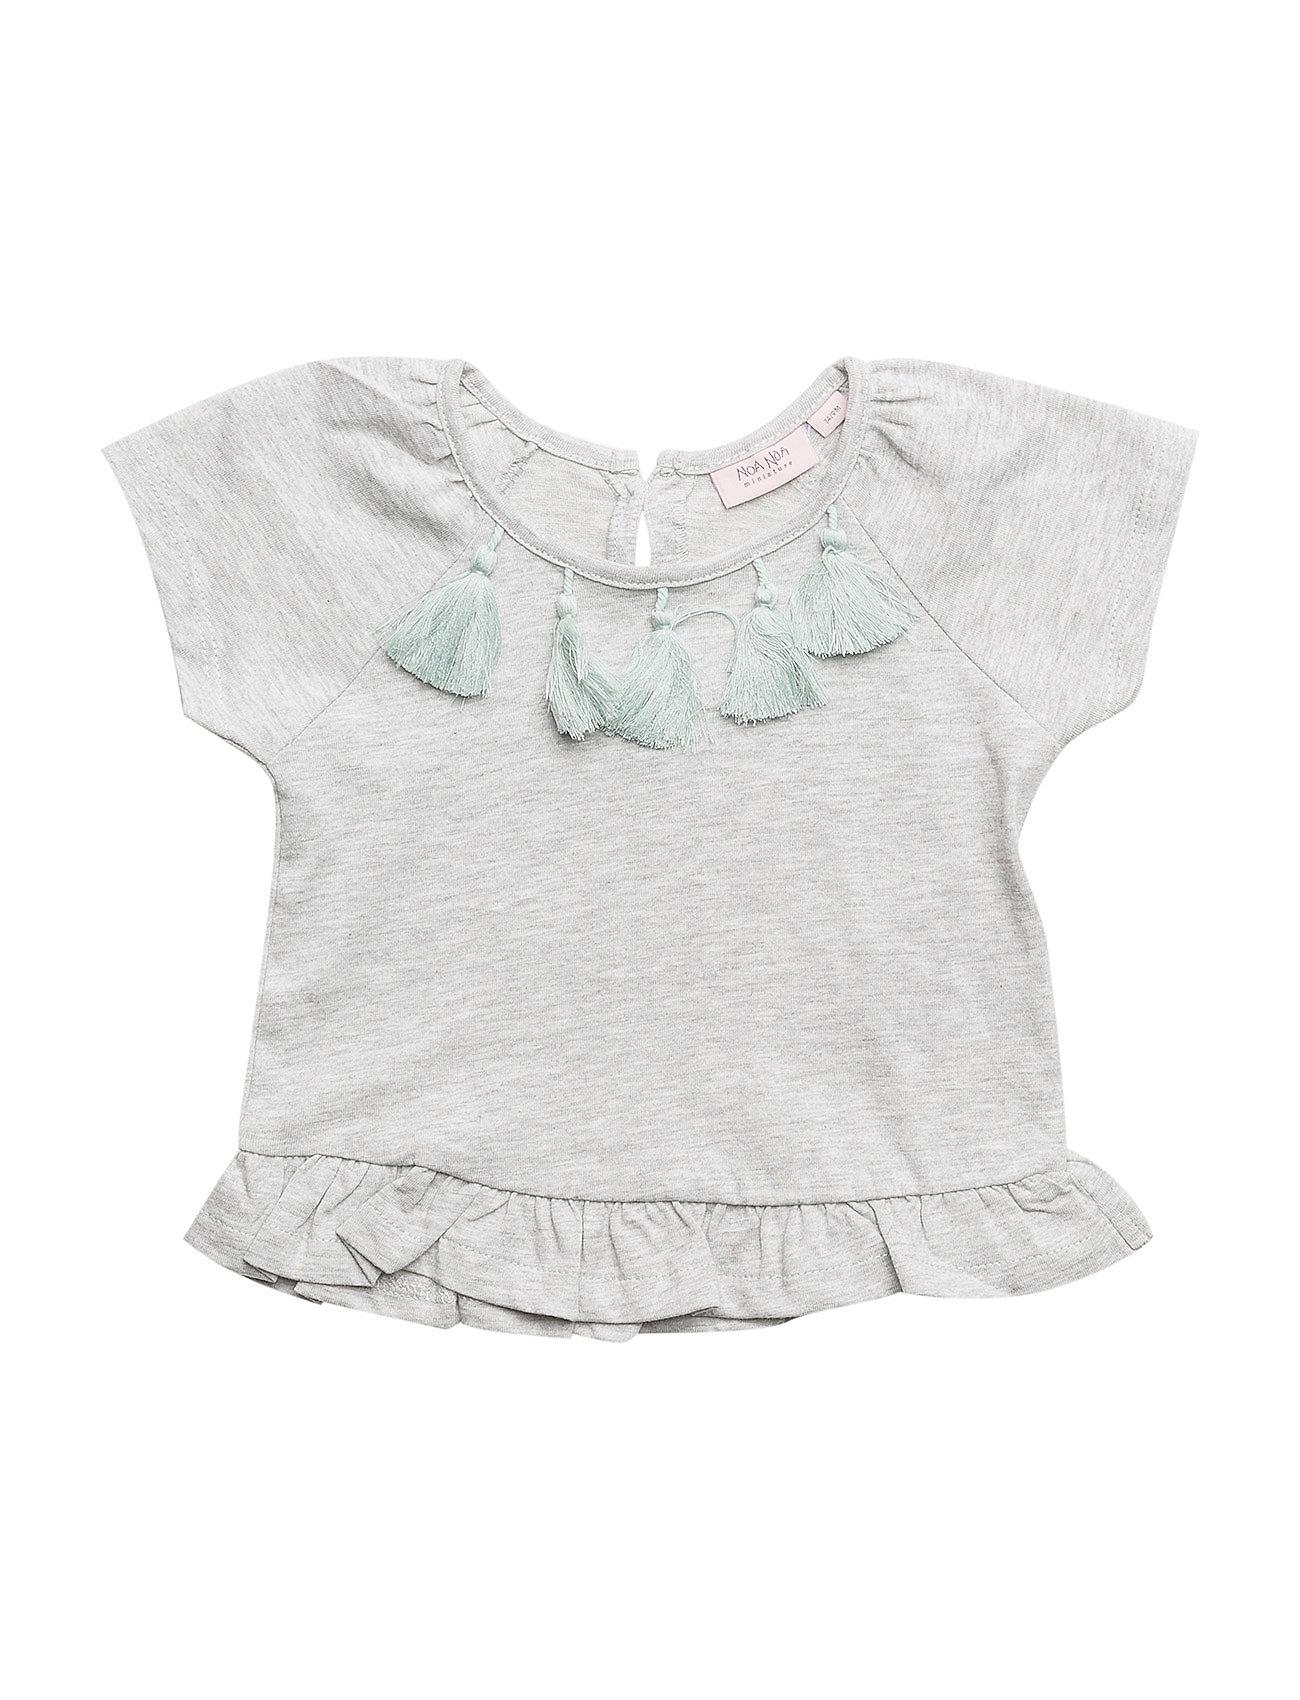 Noa Noa Miniature T-shirt - GREY MELANGE